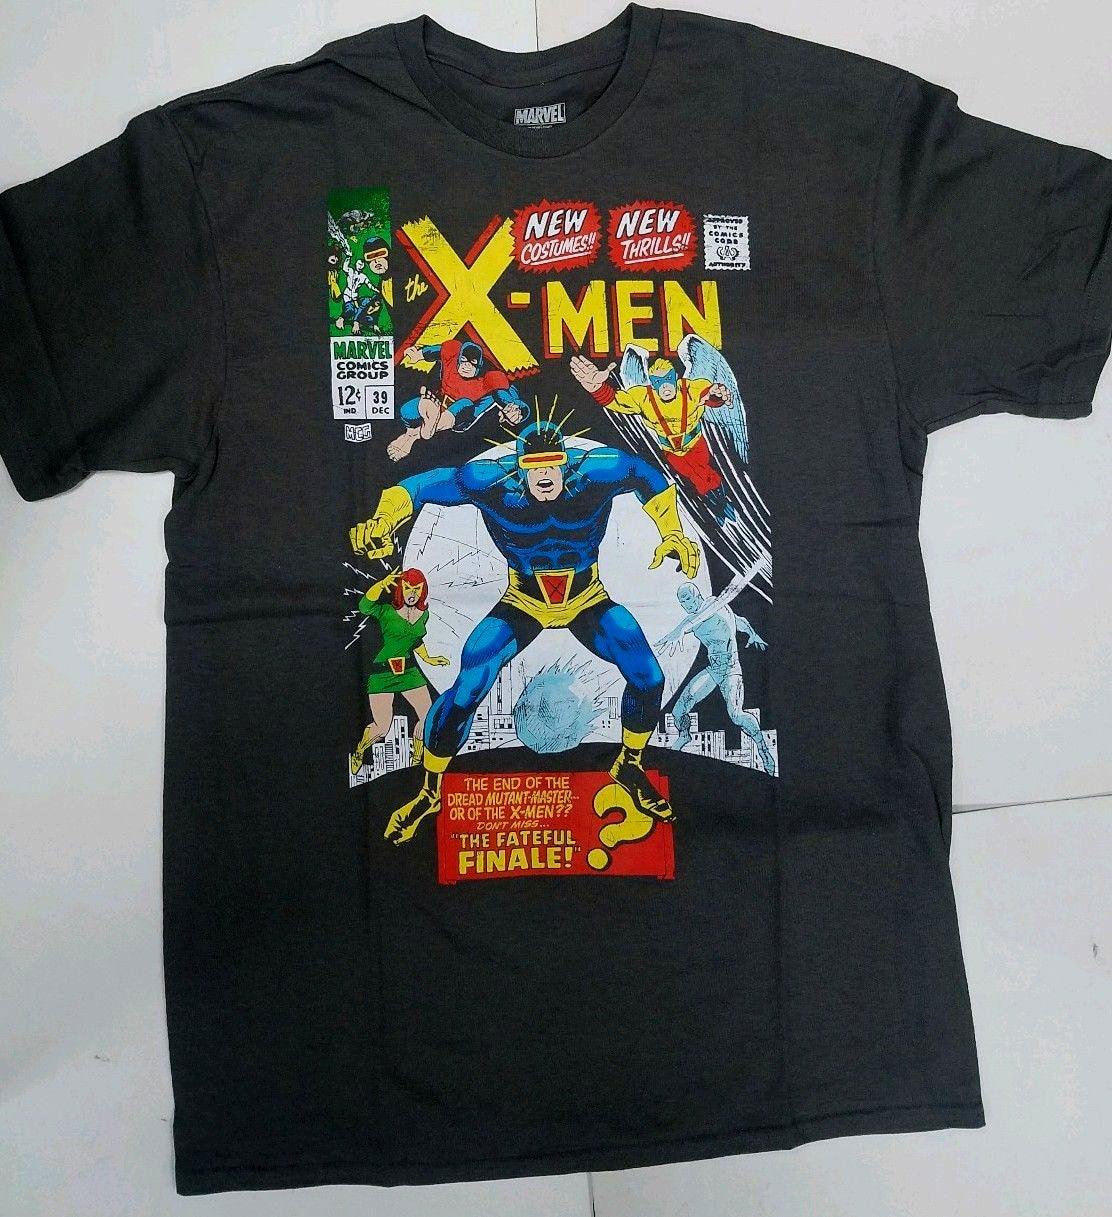 Marvel Comics x-men Cyclops The Fateful Finale camiseta para hombres adolescentes algodón Natural impreso camiseta Camiseta cuello redondo hombres